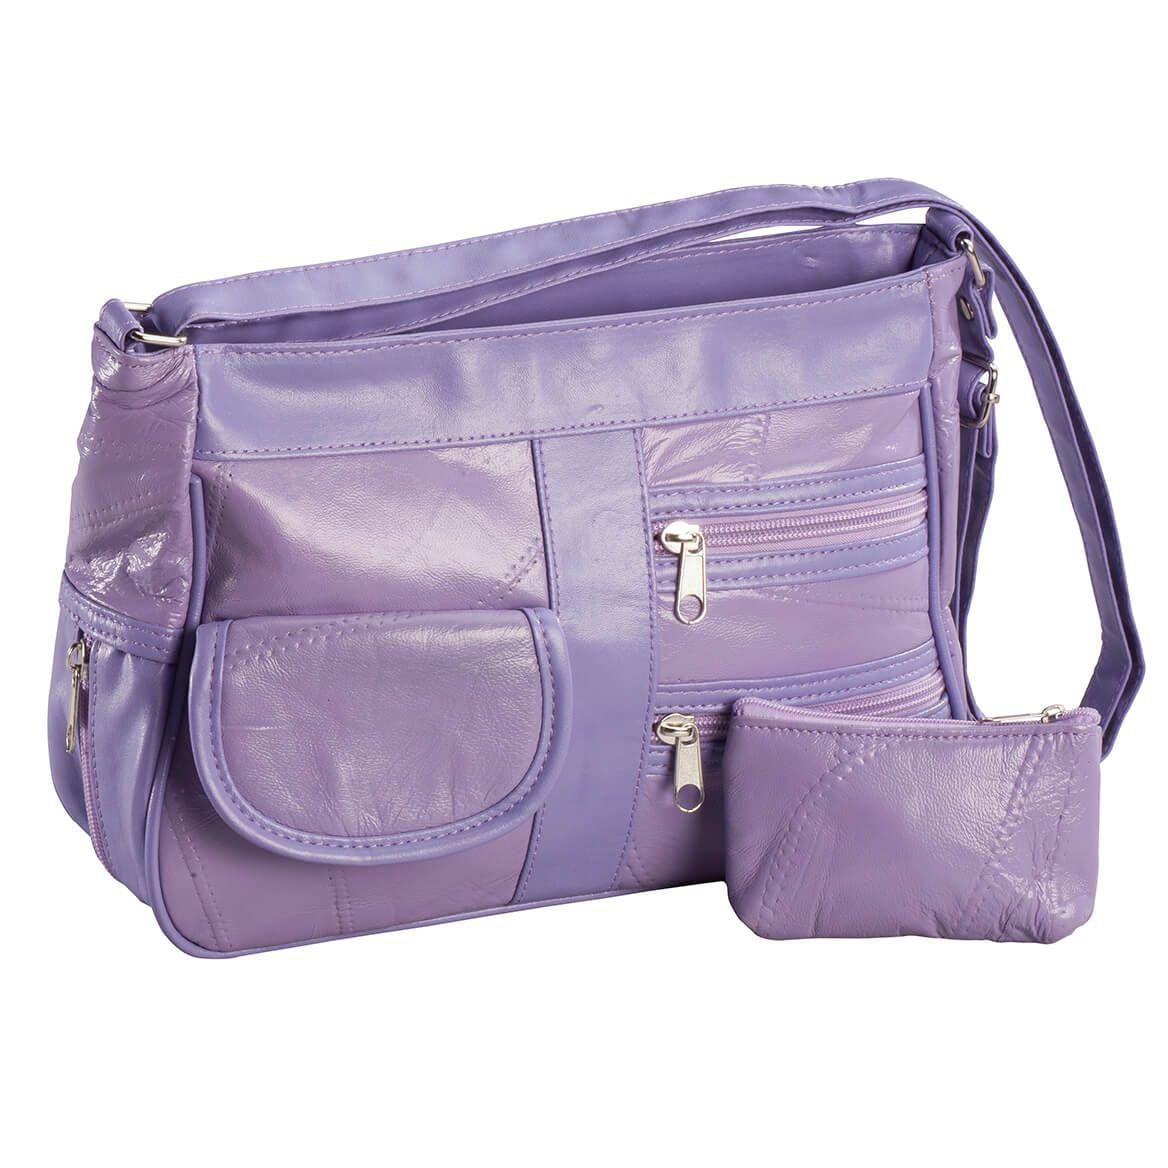 Lamb Leather Handbag, 2-Piece Set-363214